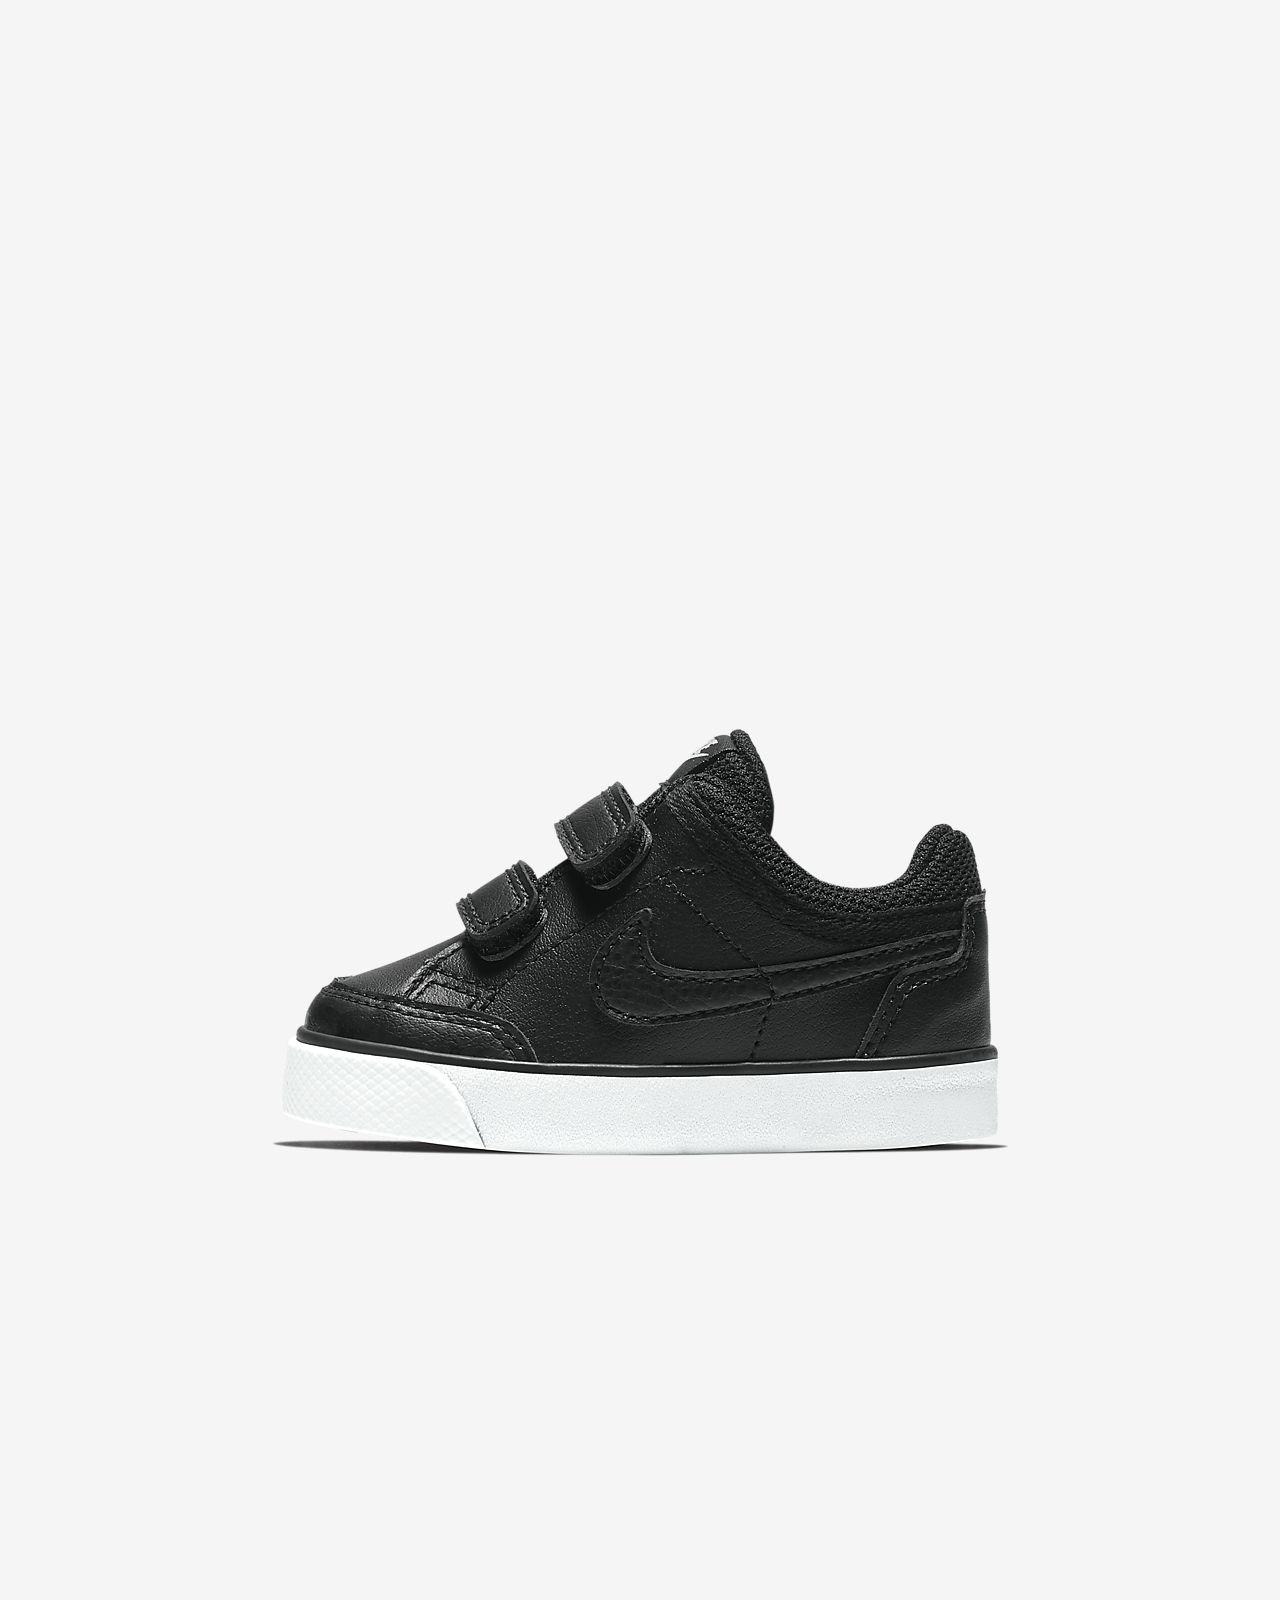 the best attitude 06050 3c067 Nike Capri 3 InfantToddler Shoe. Nike.com